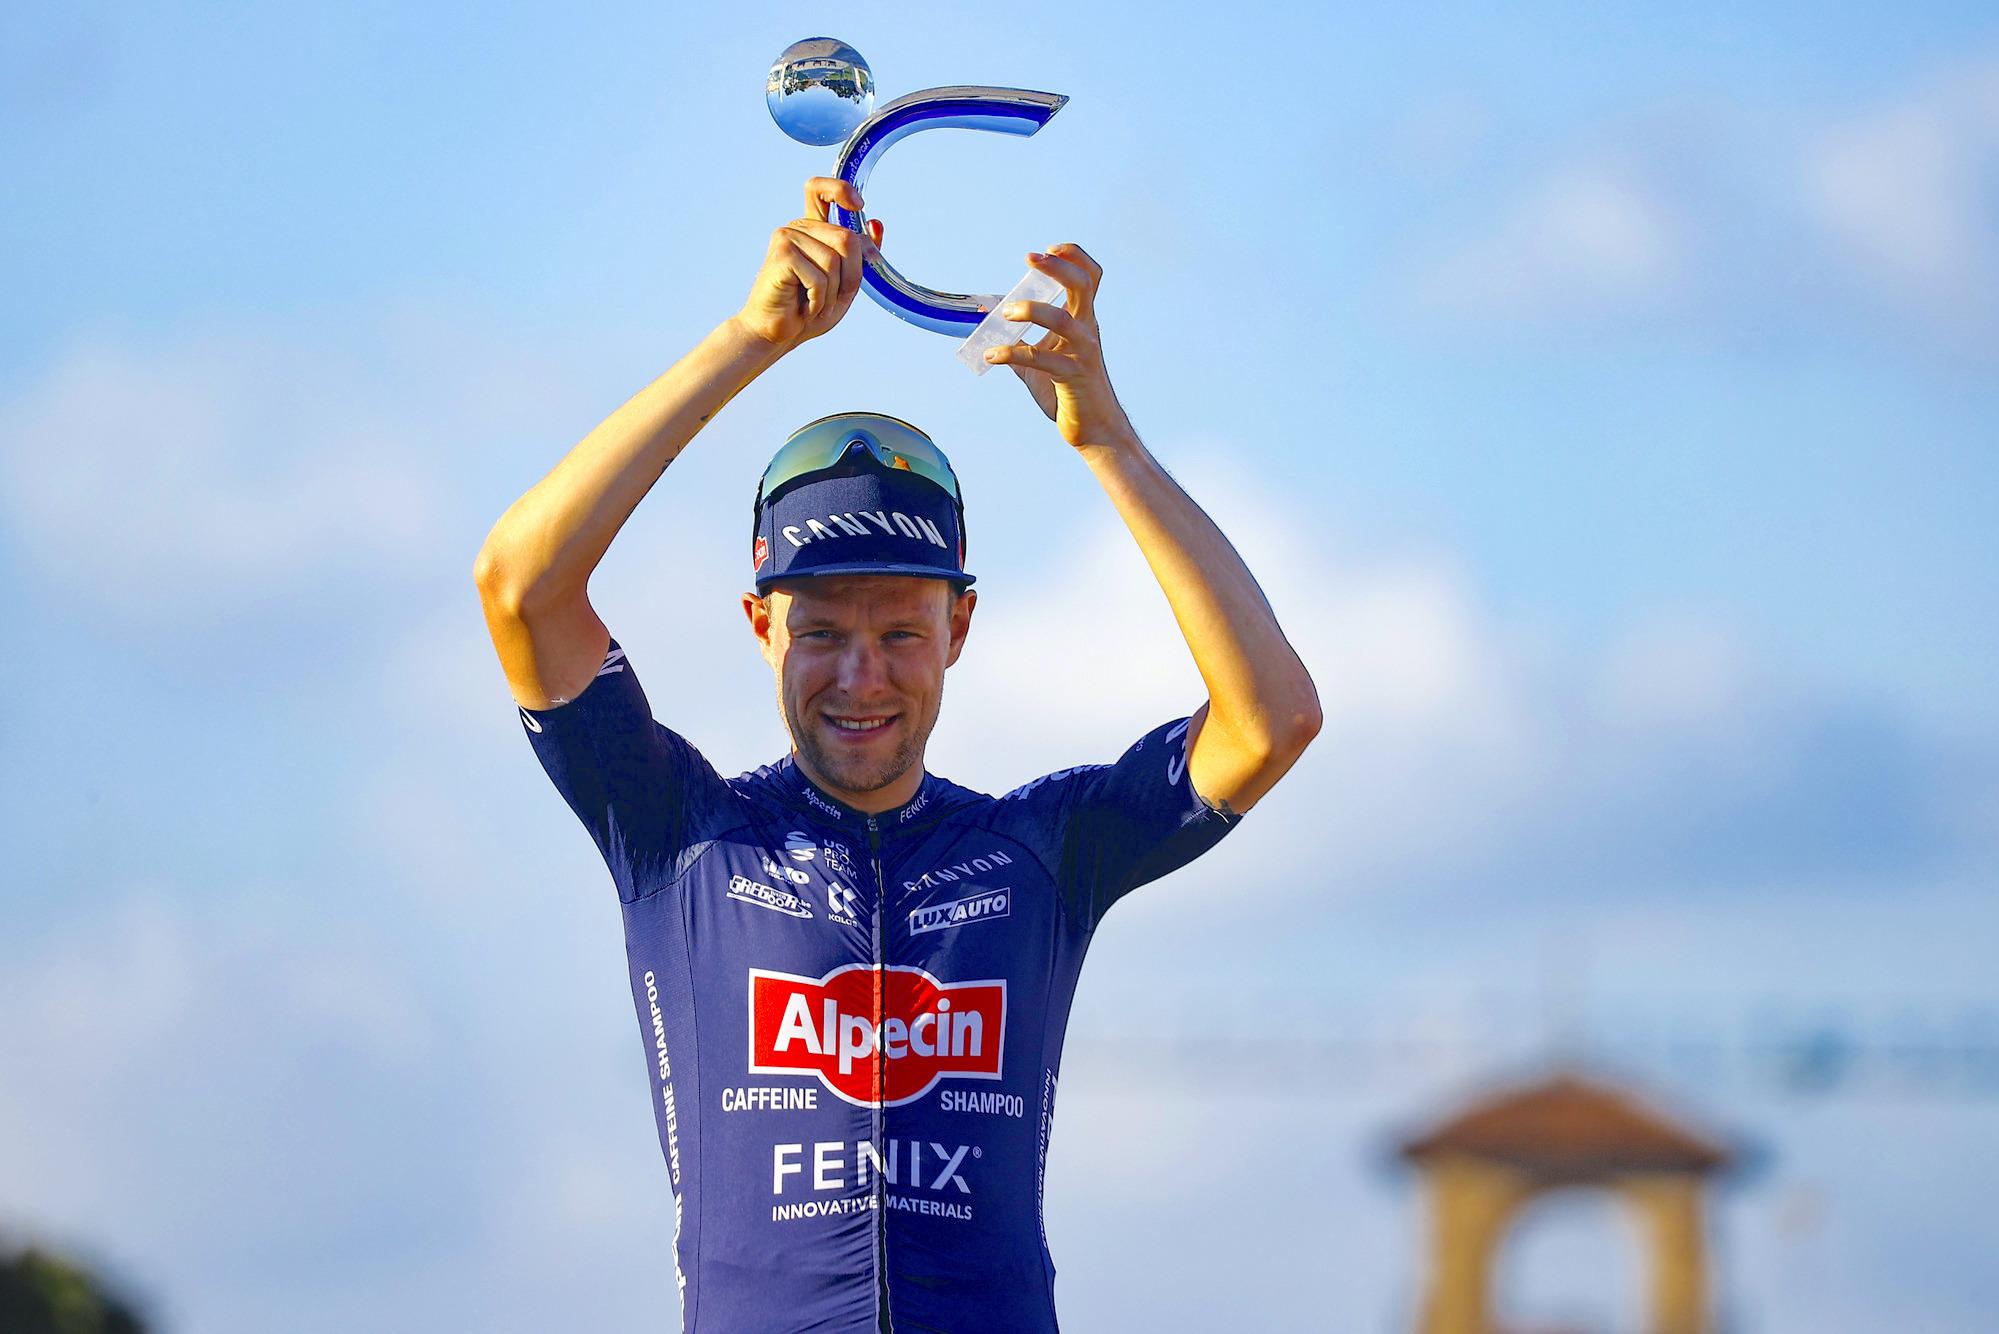 Meurisse: Van der Poel is the biggest rider at Alpecin-Fenix but it's not  only him